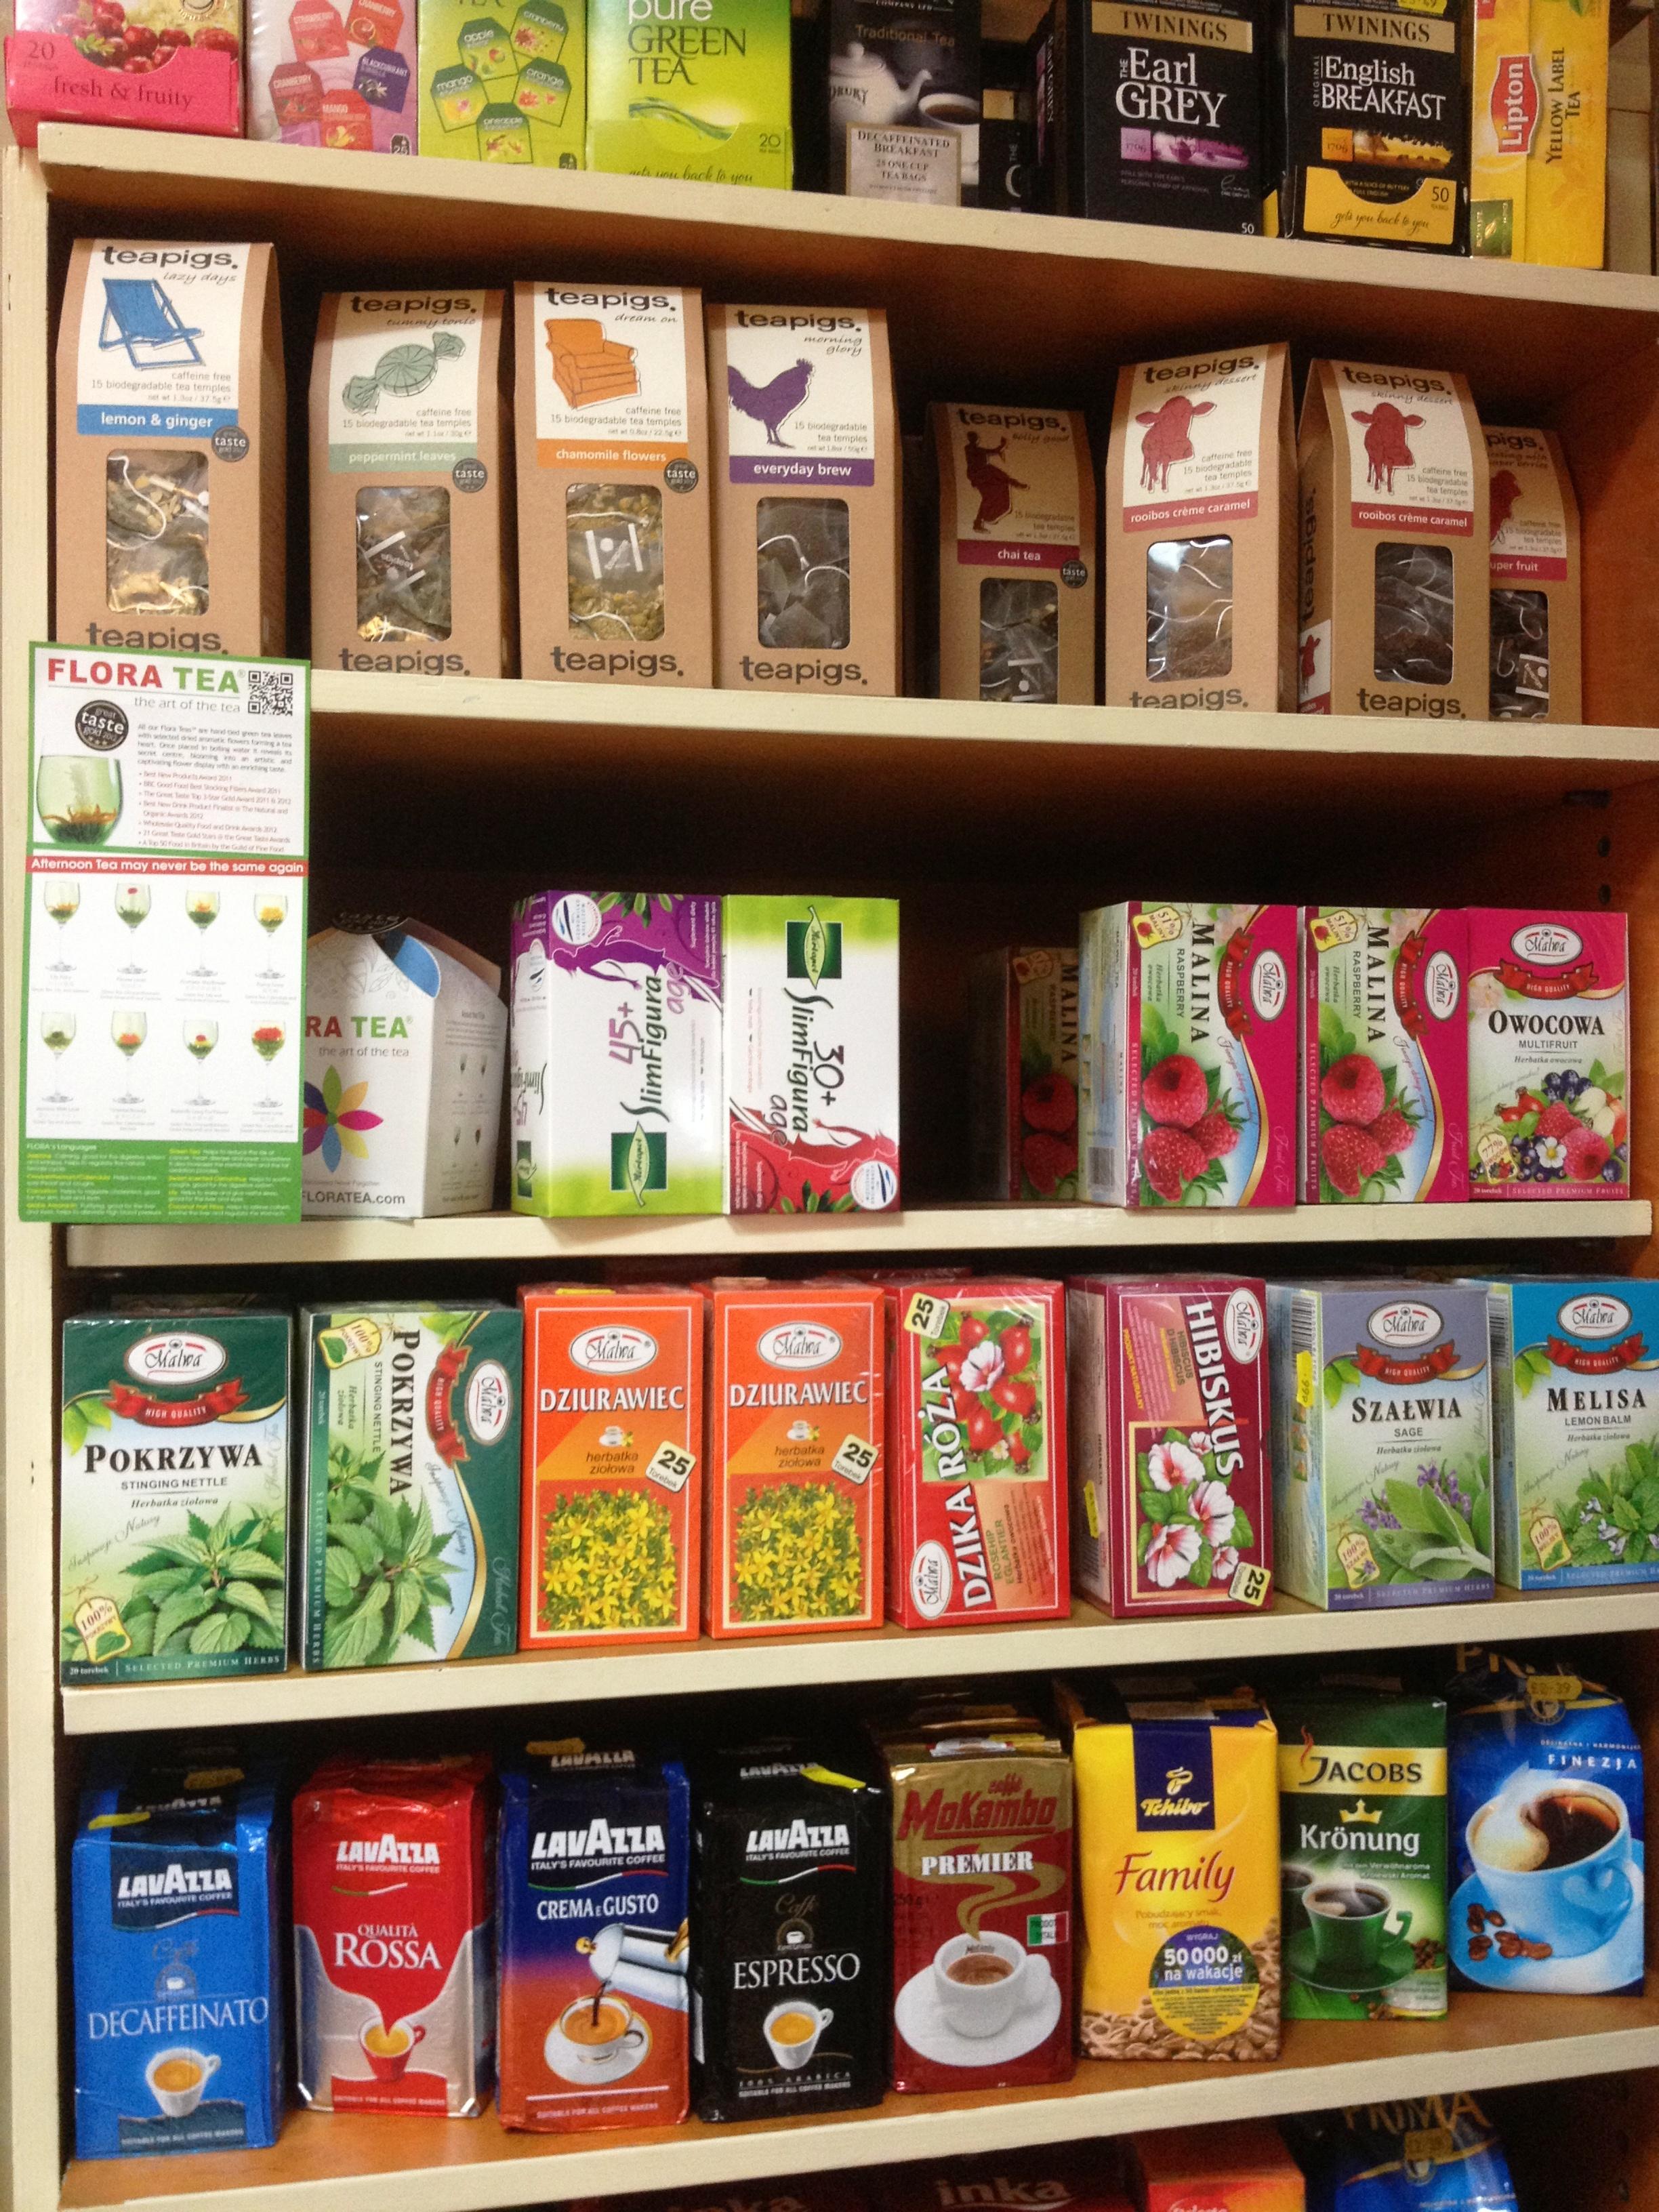 Malinka teas - kenningtonrunoff.com